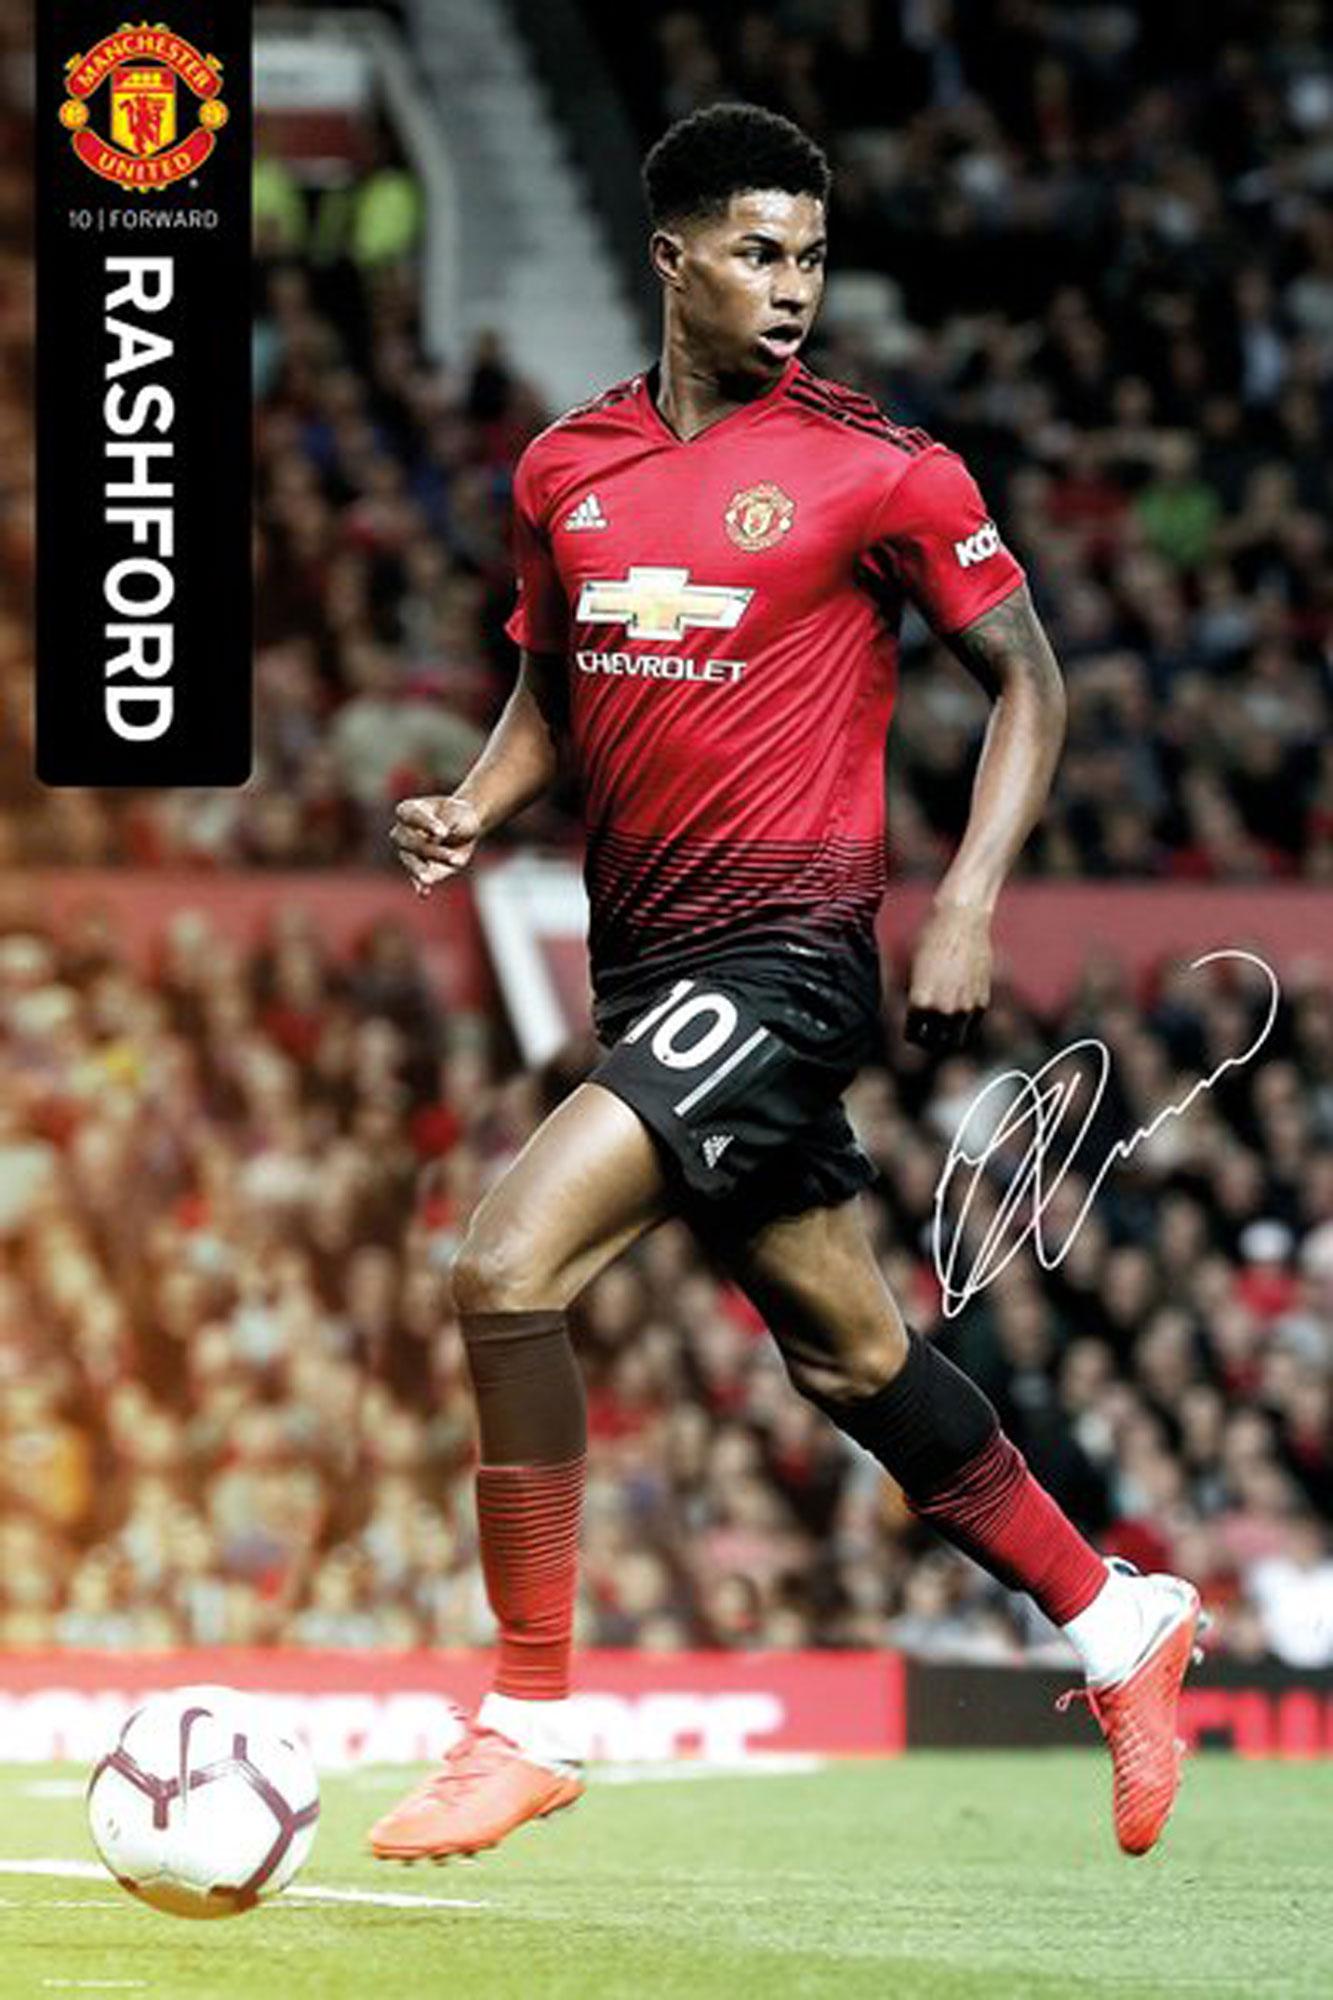 Rushford 18/19 Manchester United Fußball Poster Größe 61x91,5 cm